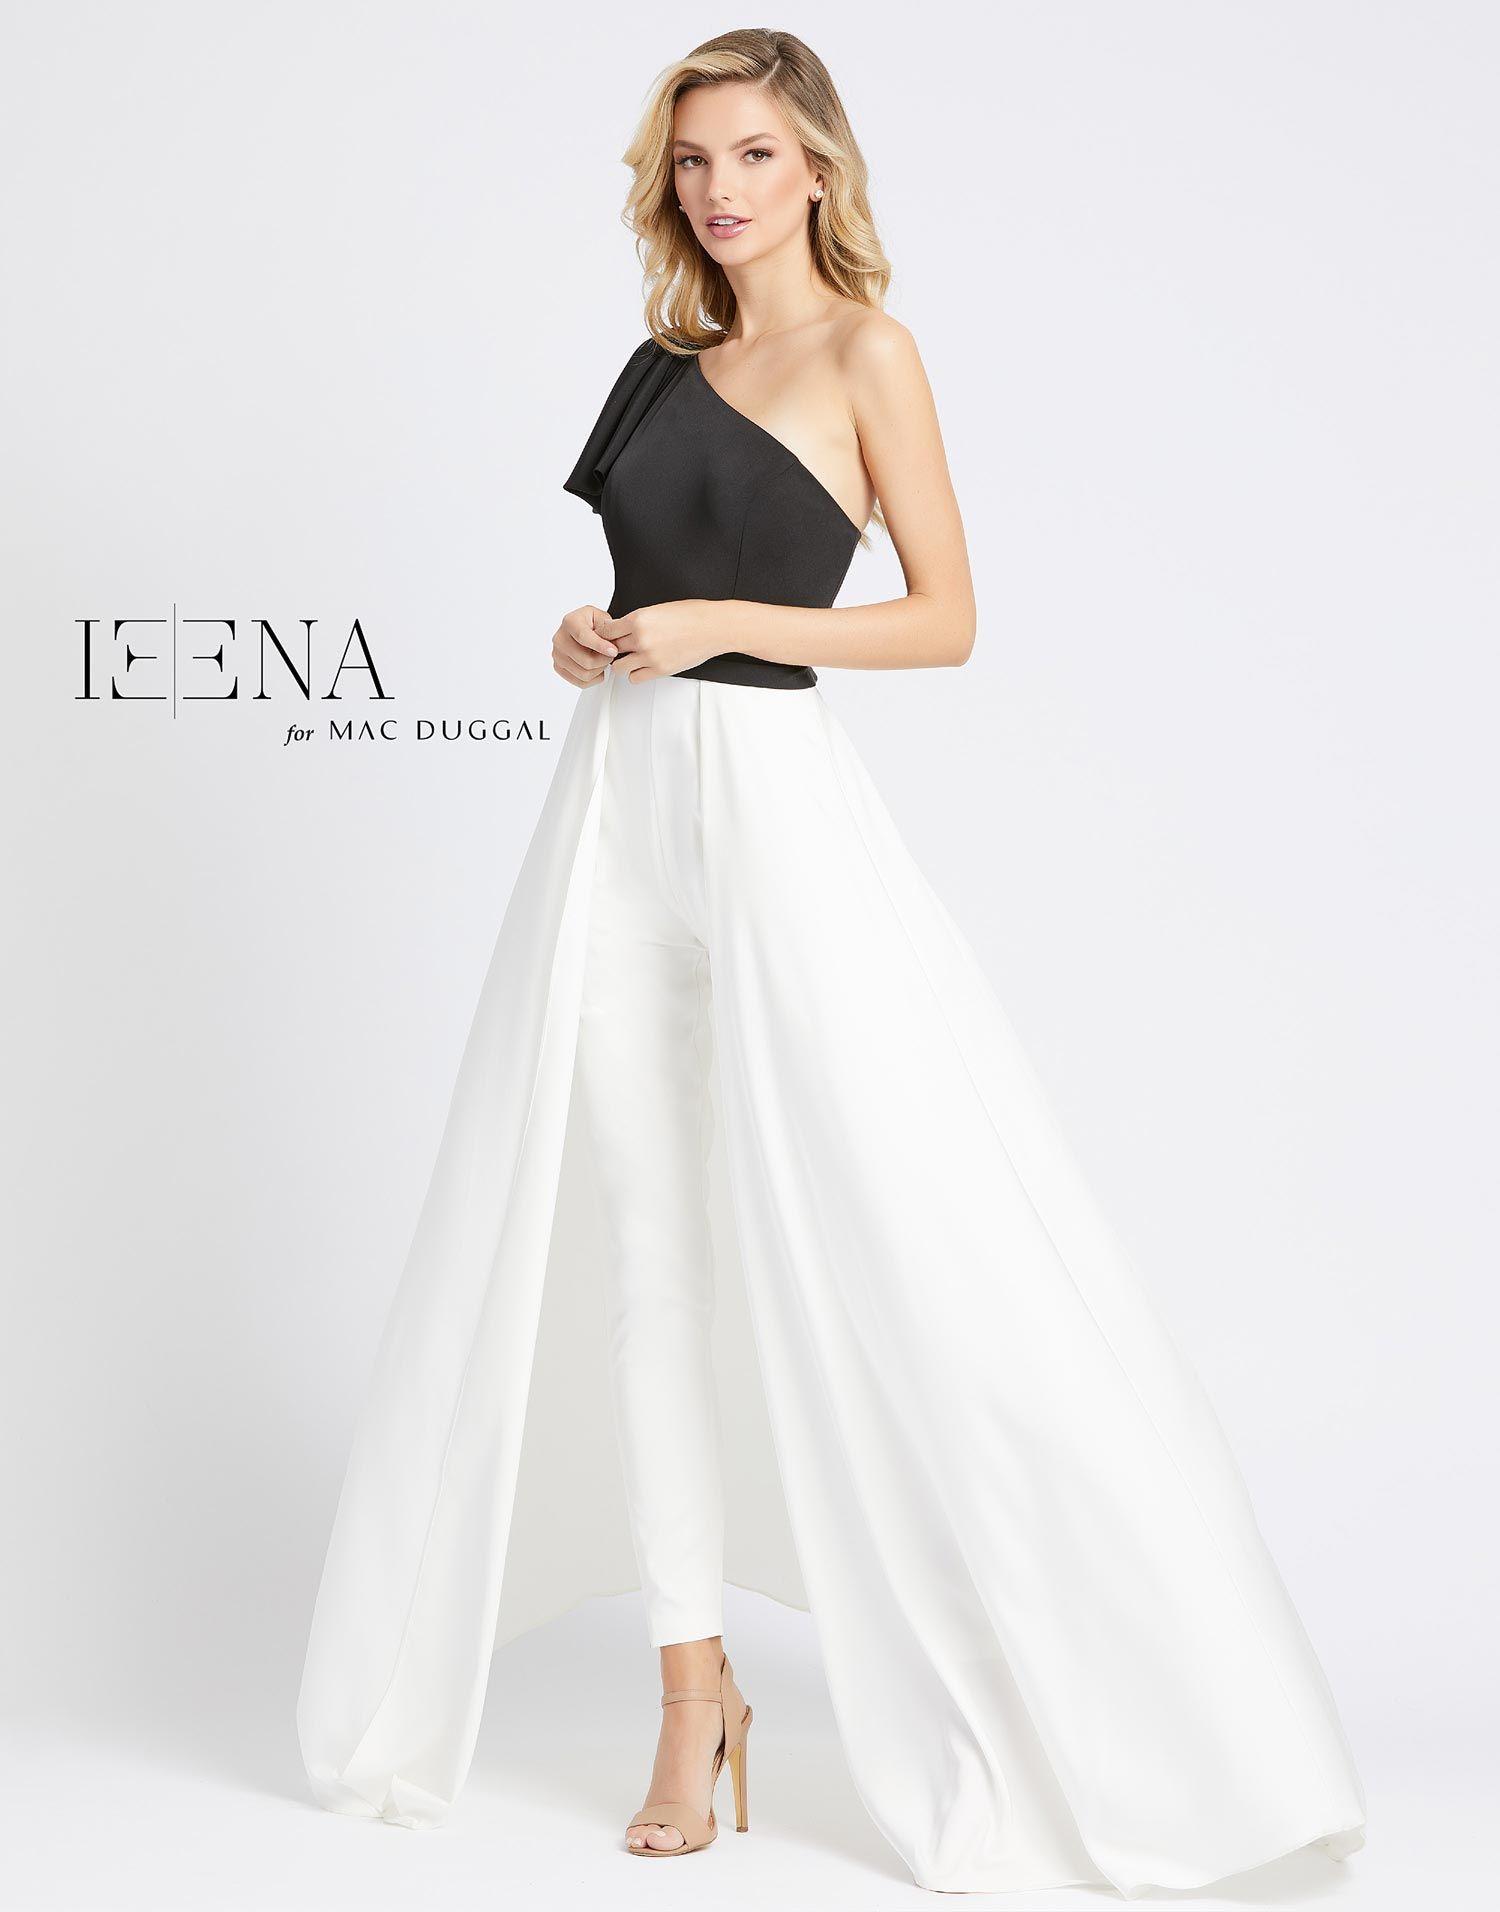 26191i Ieena For Mac Duggal Ieena Duggal Asymmetric Jumpsuit Formal Dresses [ 1912 x 1500 Pixel ]